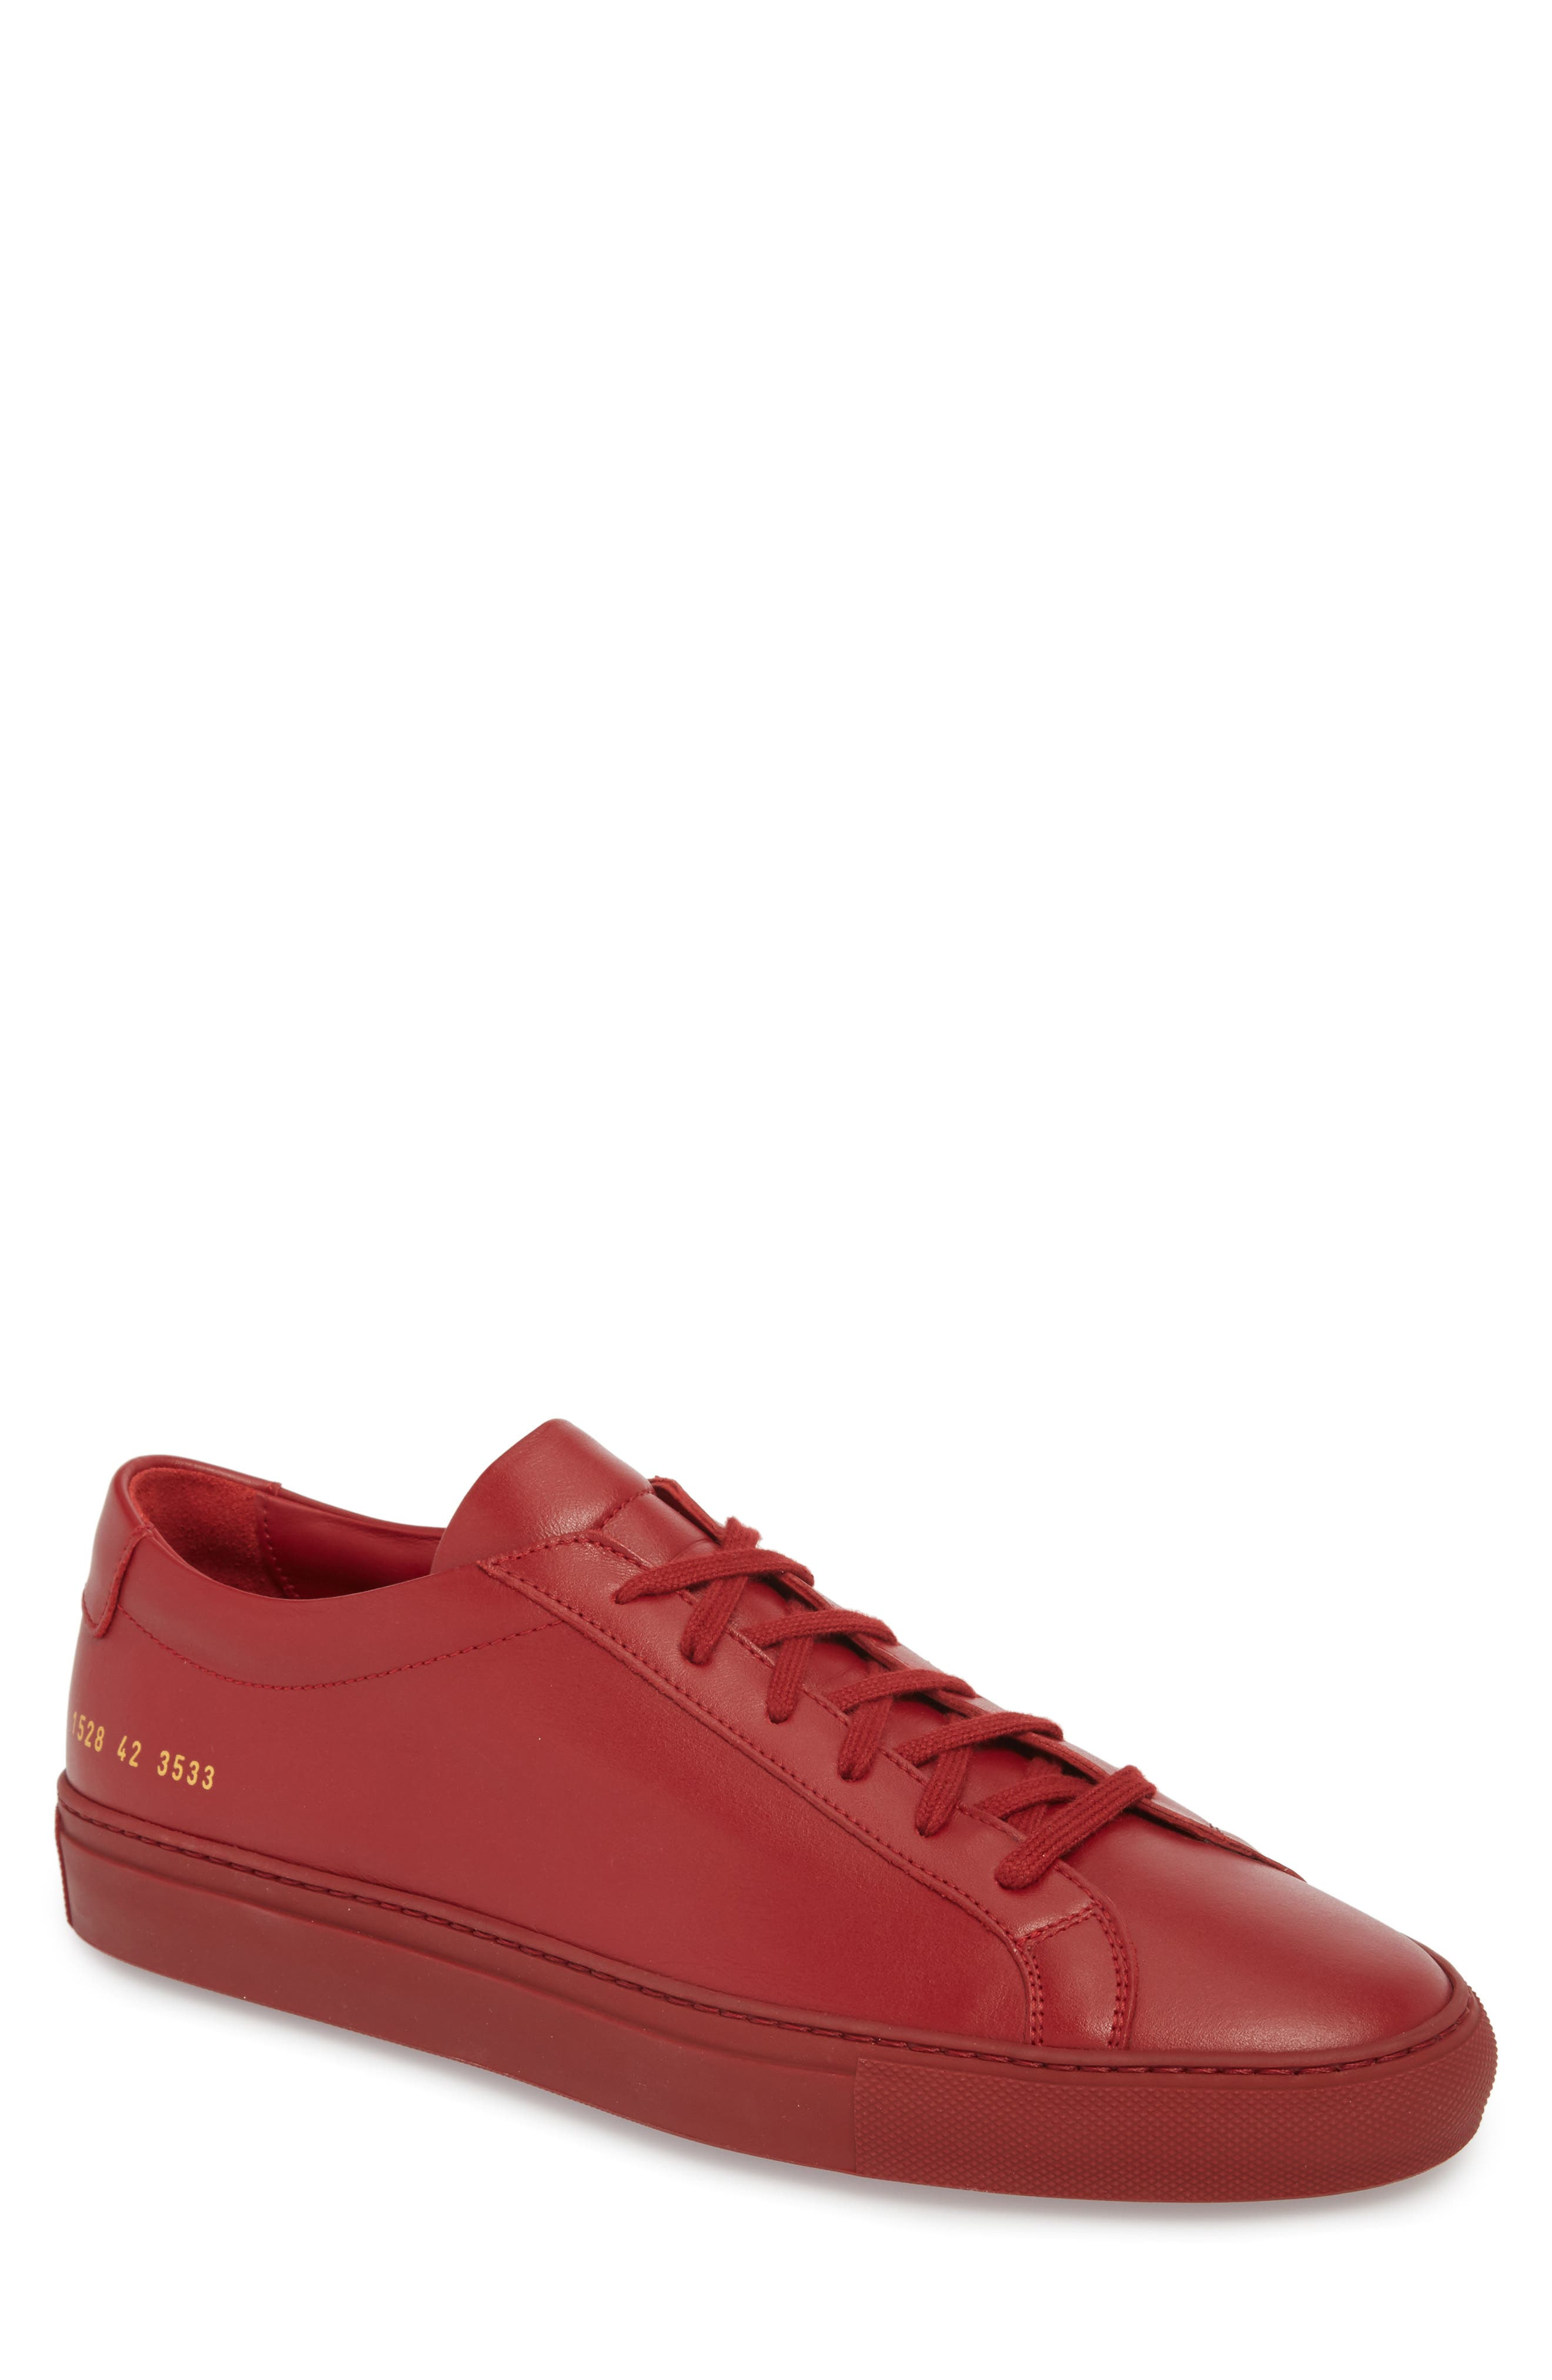 Original Achilles Sneaker,                         Main,                         color, RED LEATHER